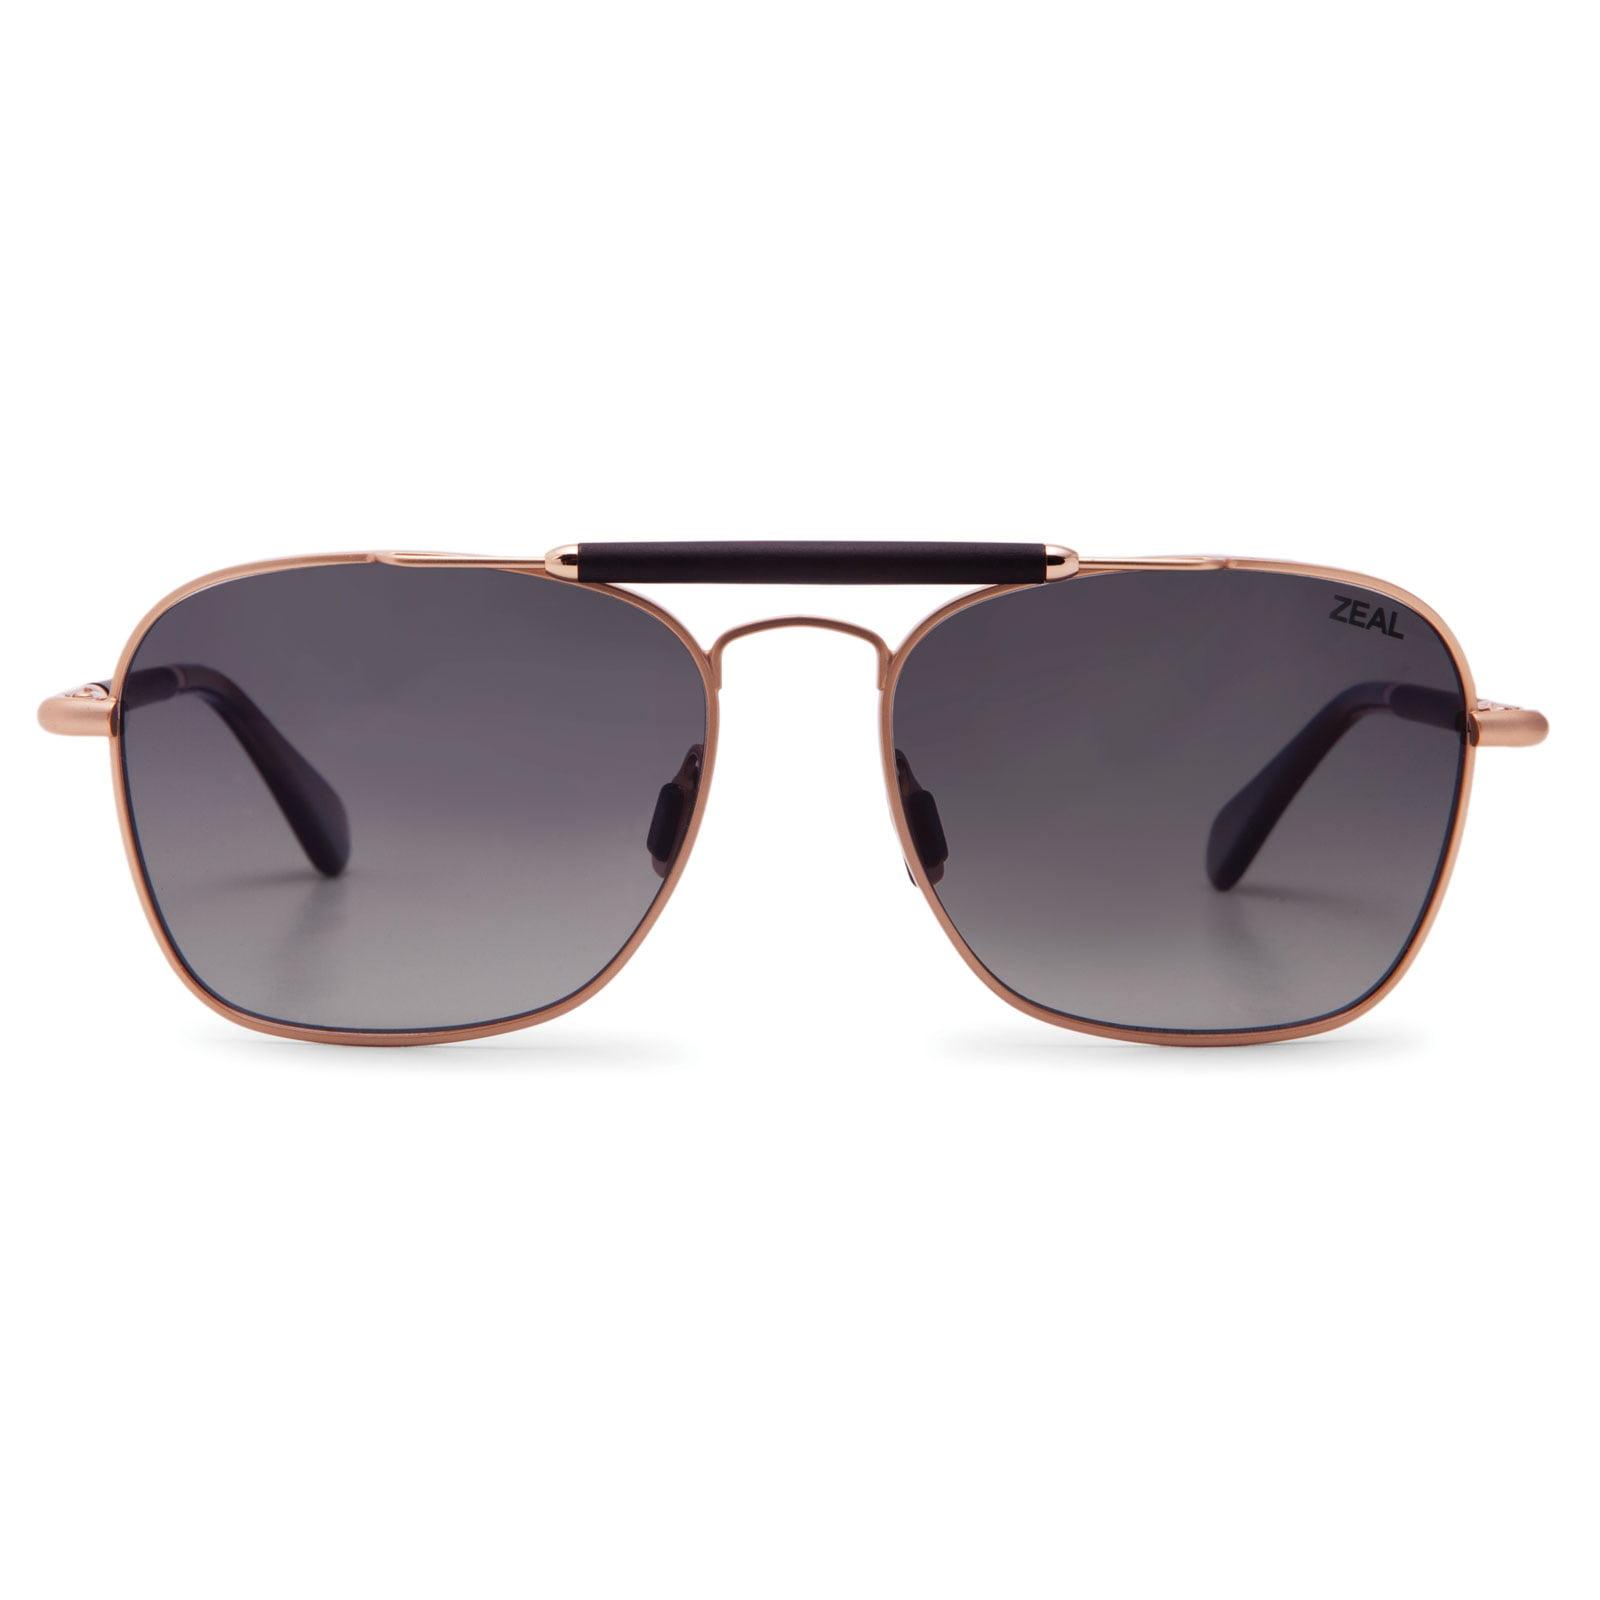 455ce76779 Zeal Optics - Zeal Optics Draper Sunglasses Eyewear UV Protection Polarized  Durable - Walmart.com